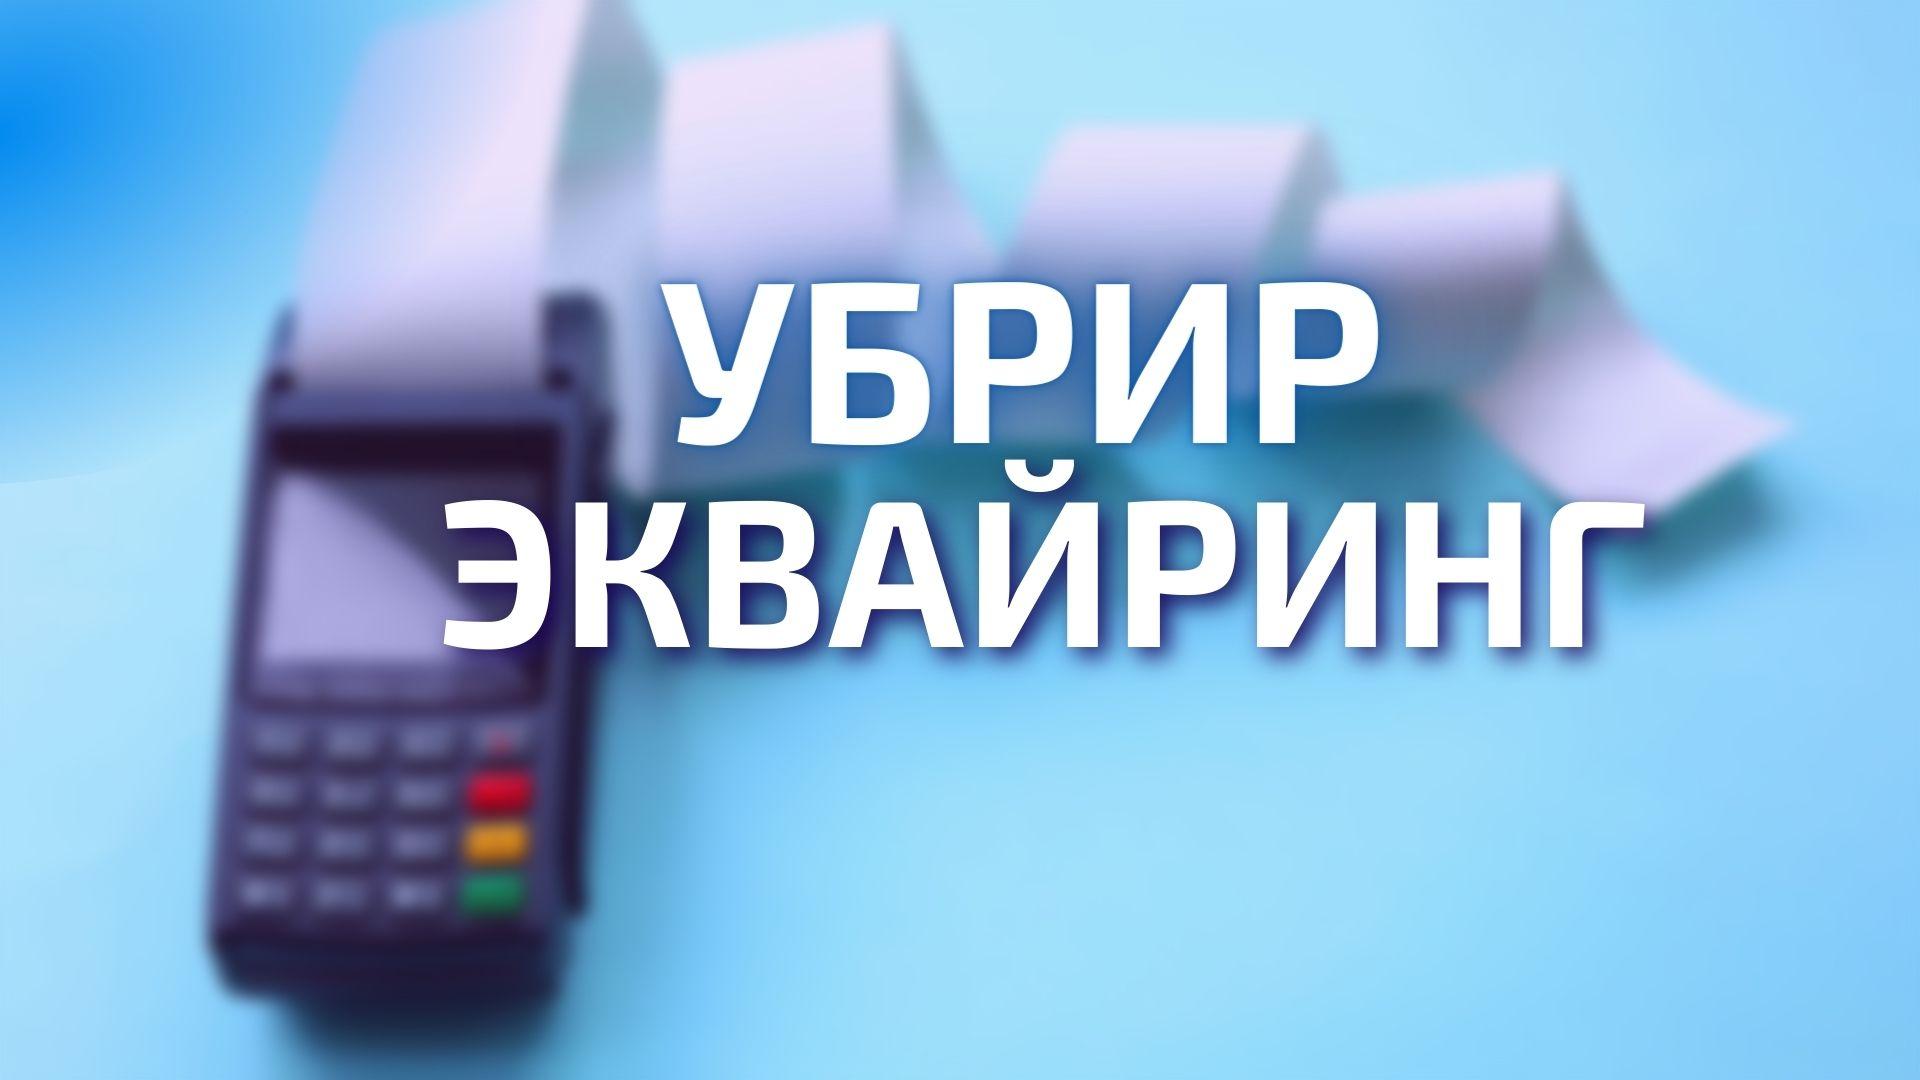 Эквайринг в Убрир банке. Тарифы для ИП и ООО